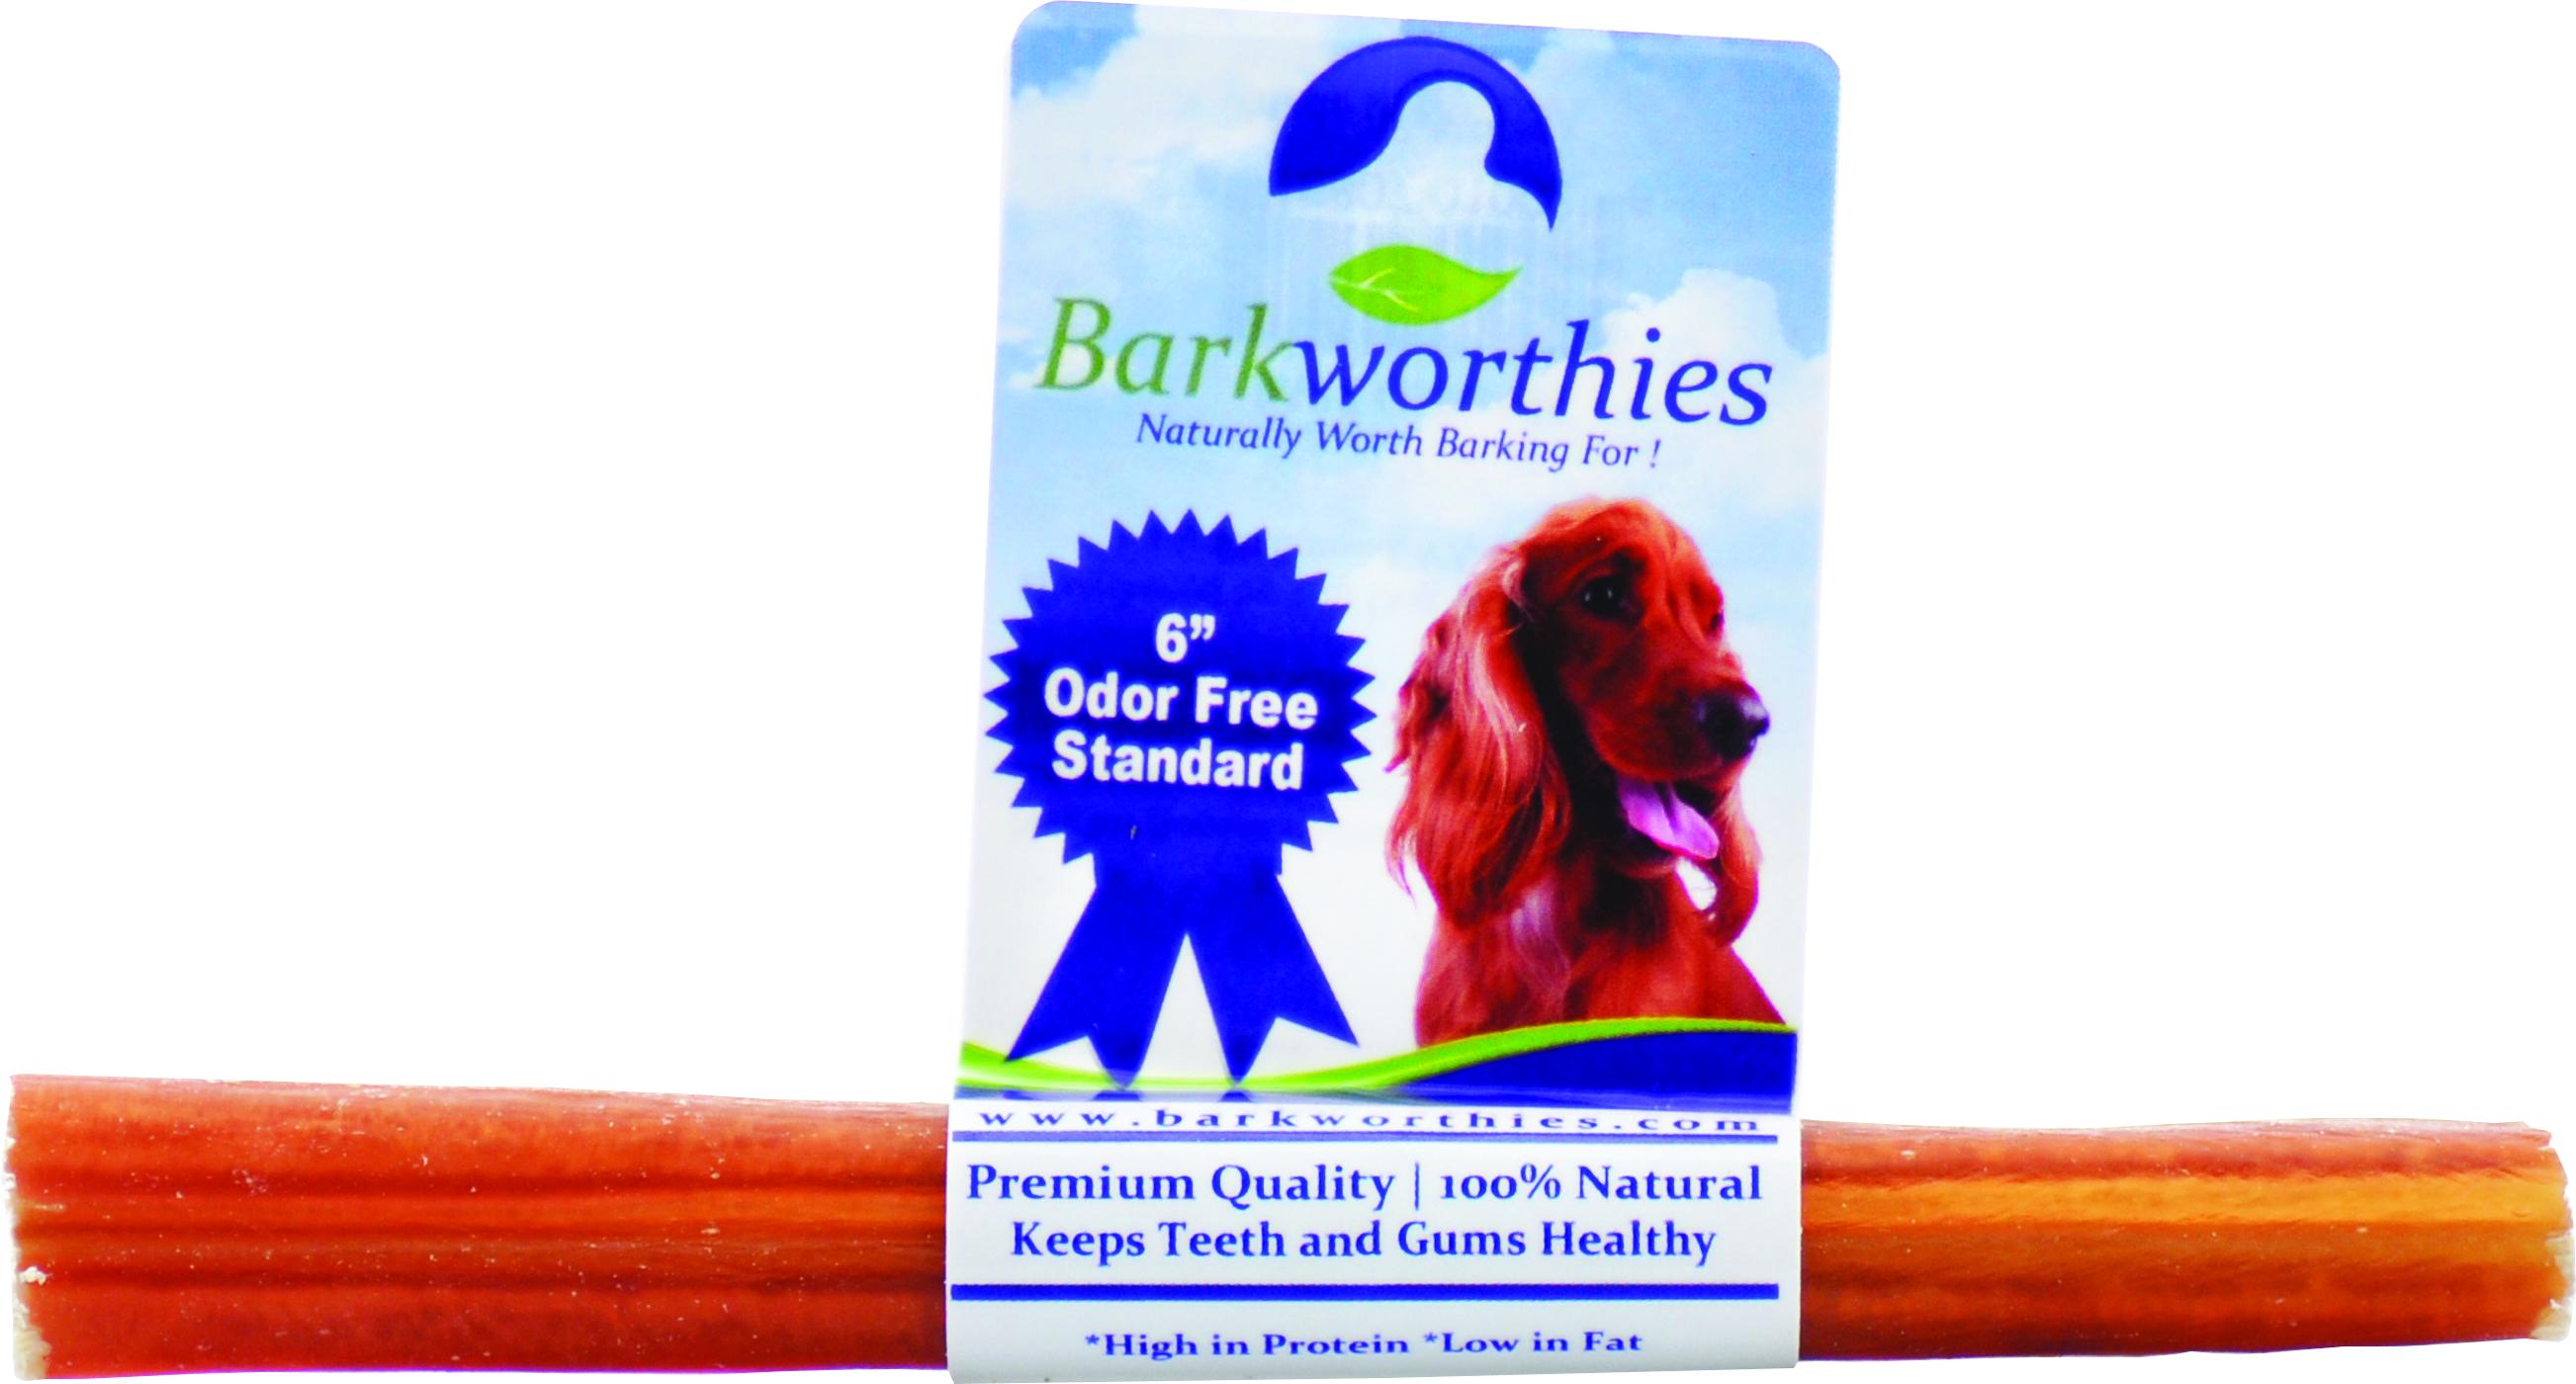 BARKWORTHIES Odor Free Standard Bully Stick